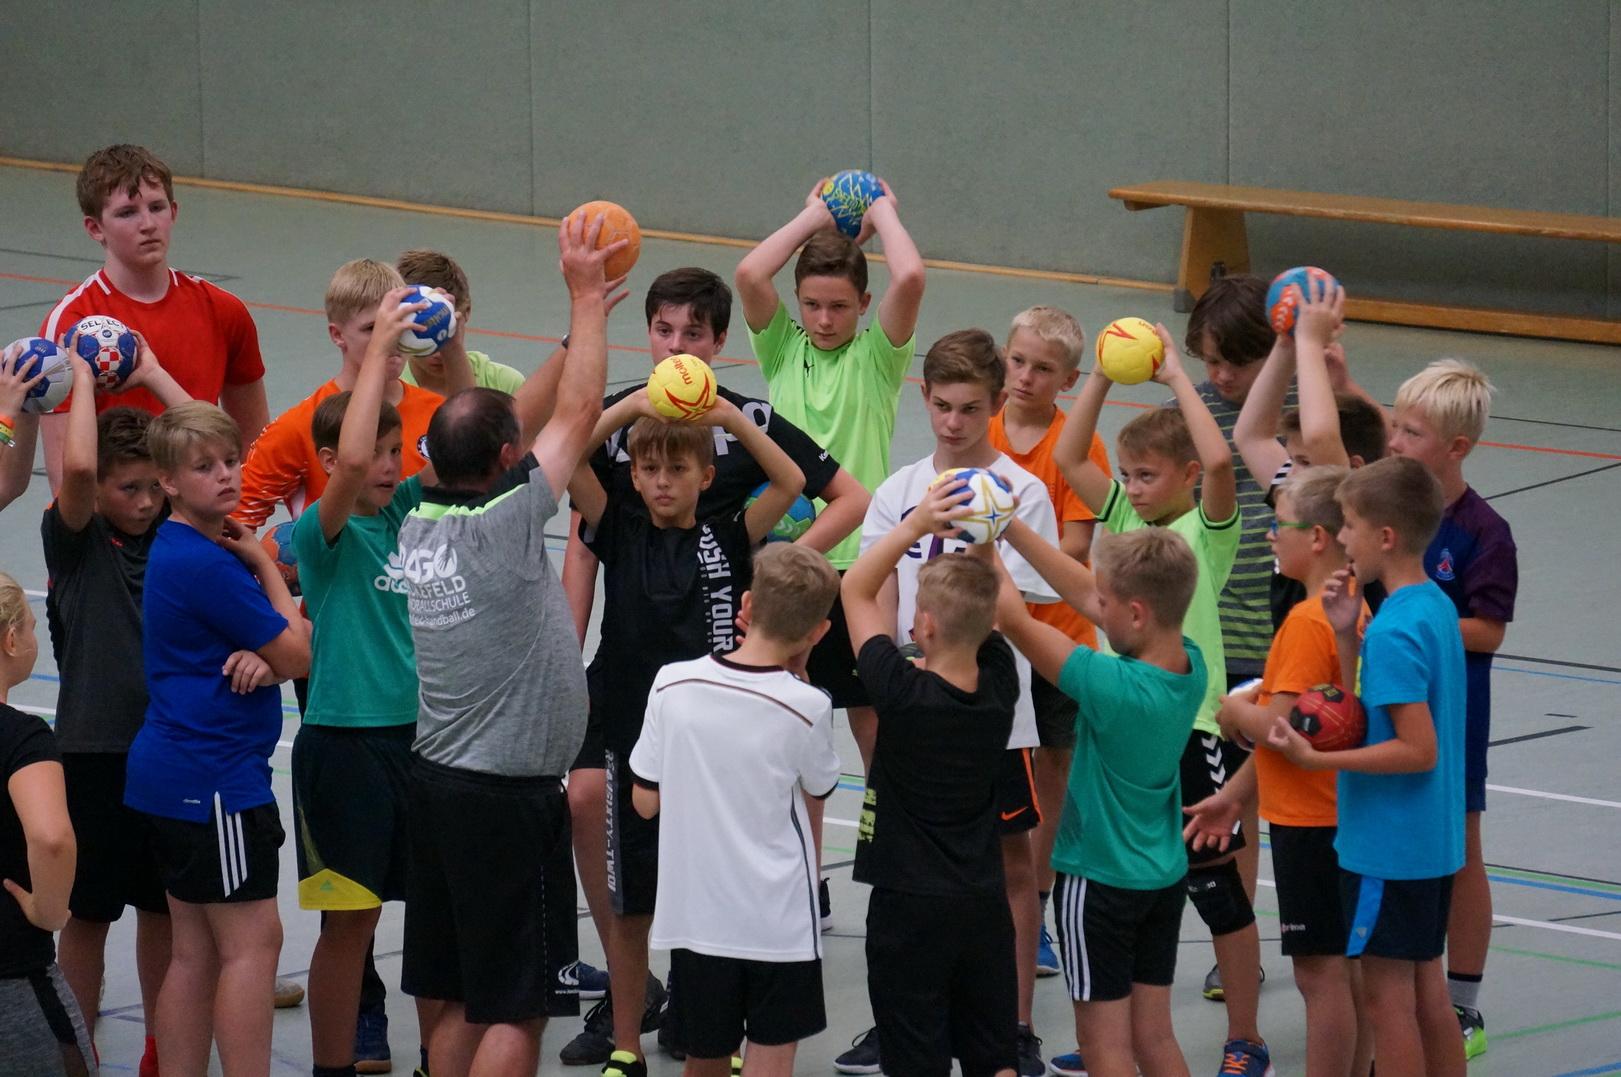 201808_Handballcamp_SDH_MG_088w